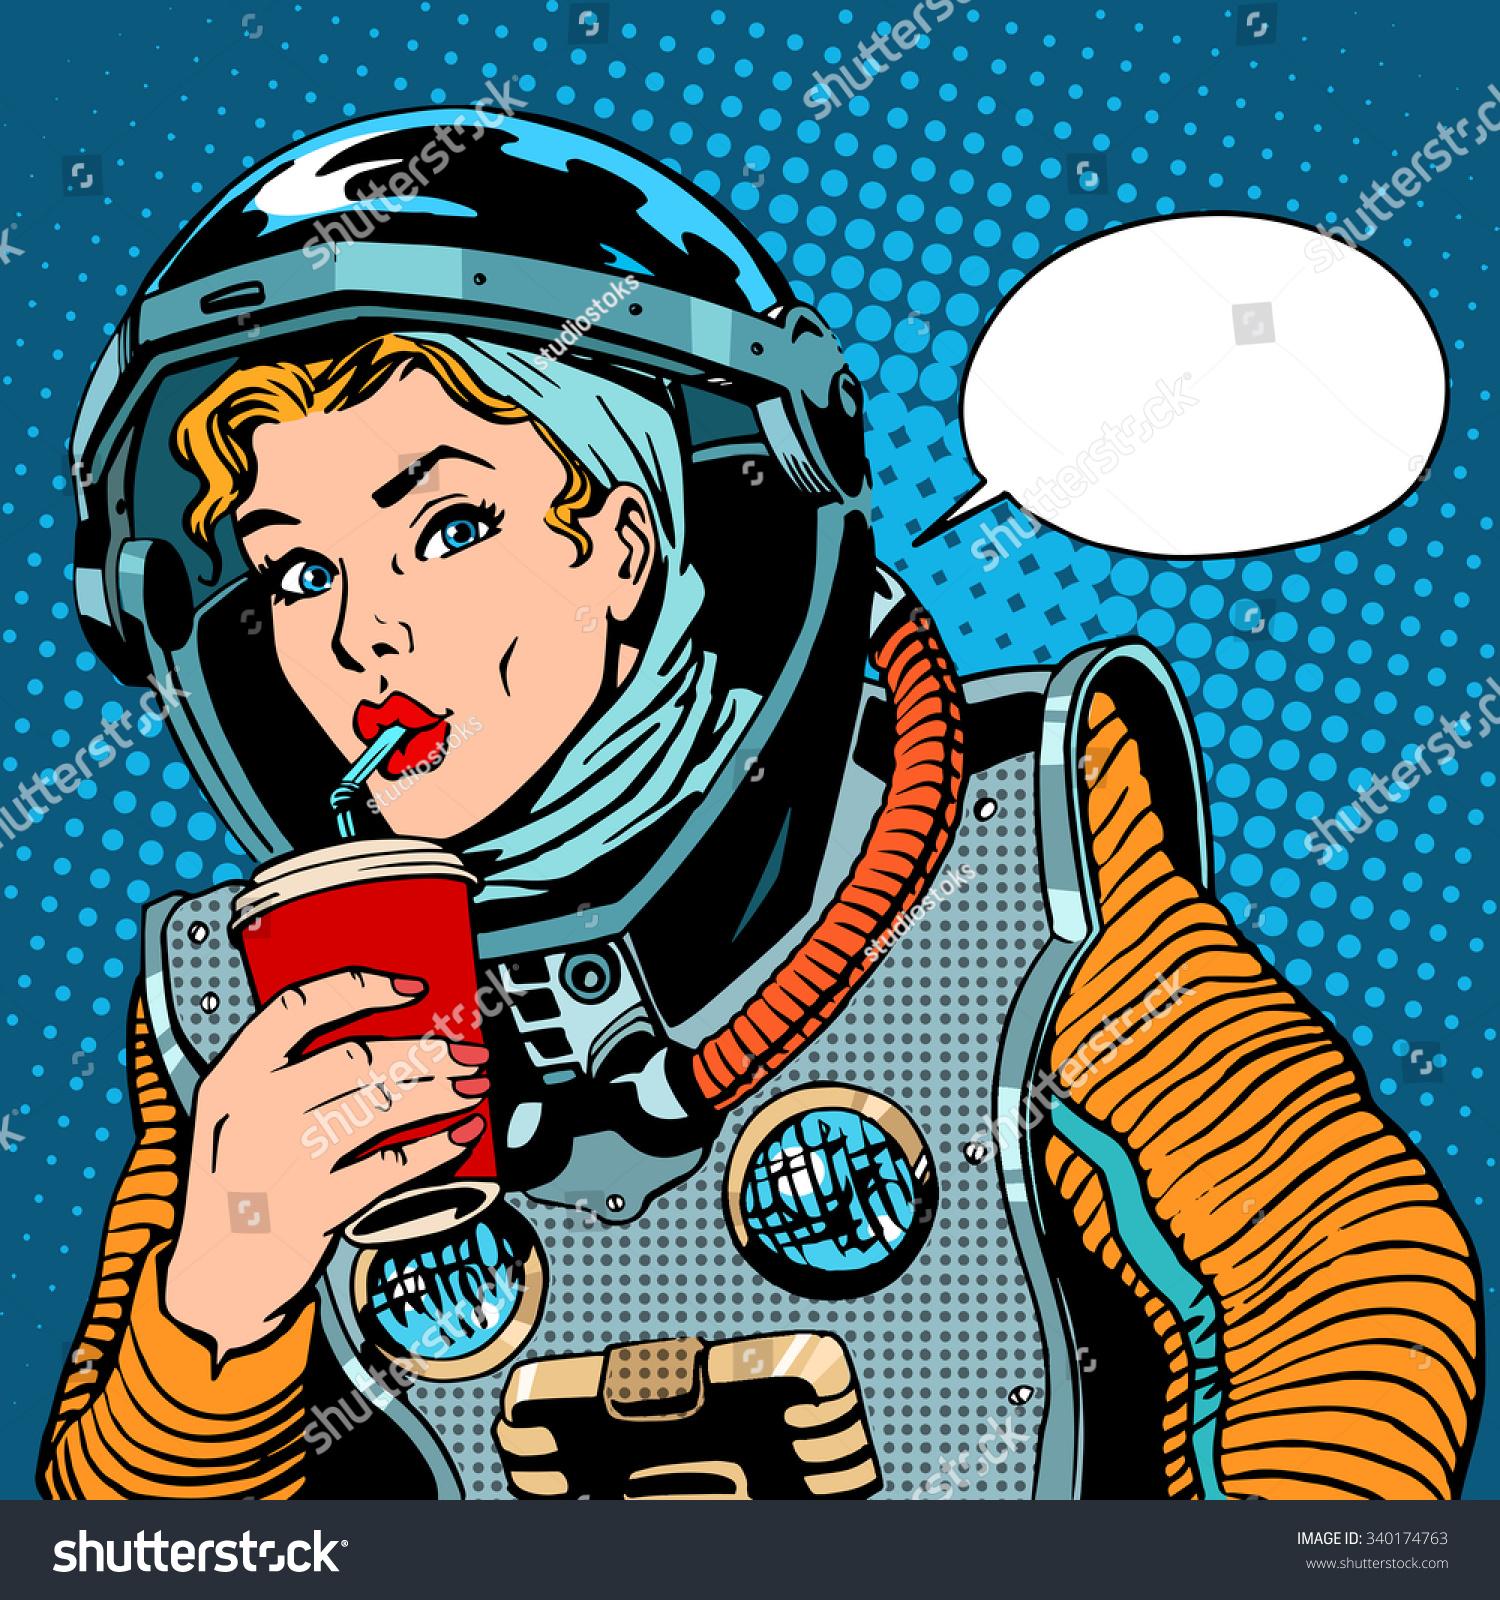 retro girl astronaut - photo #14